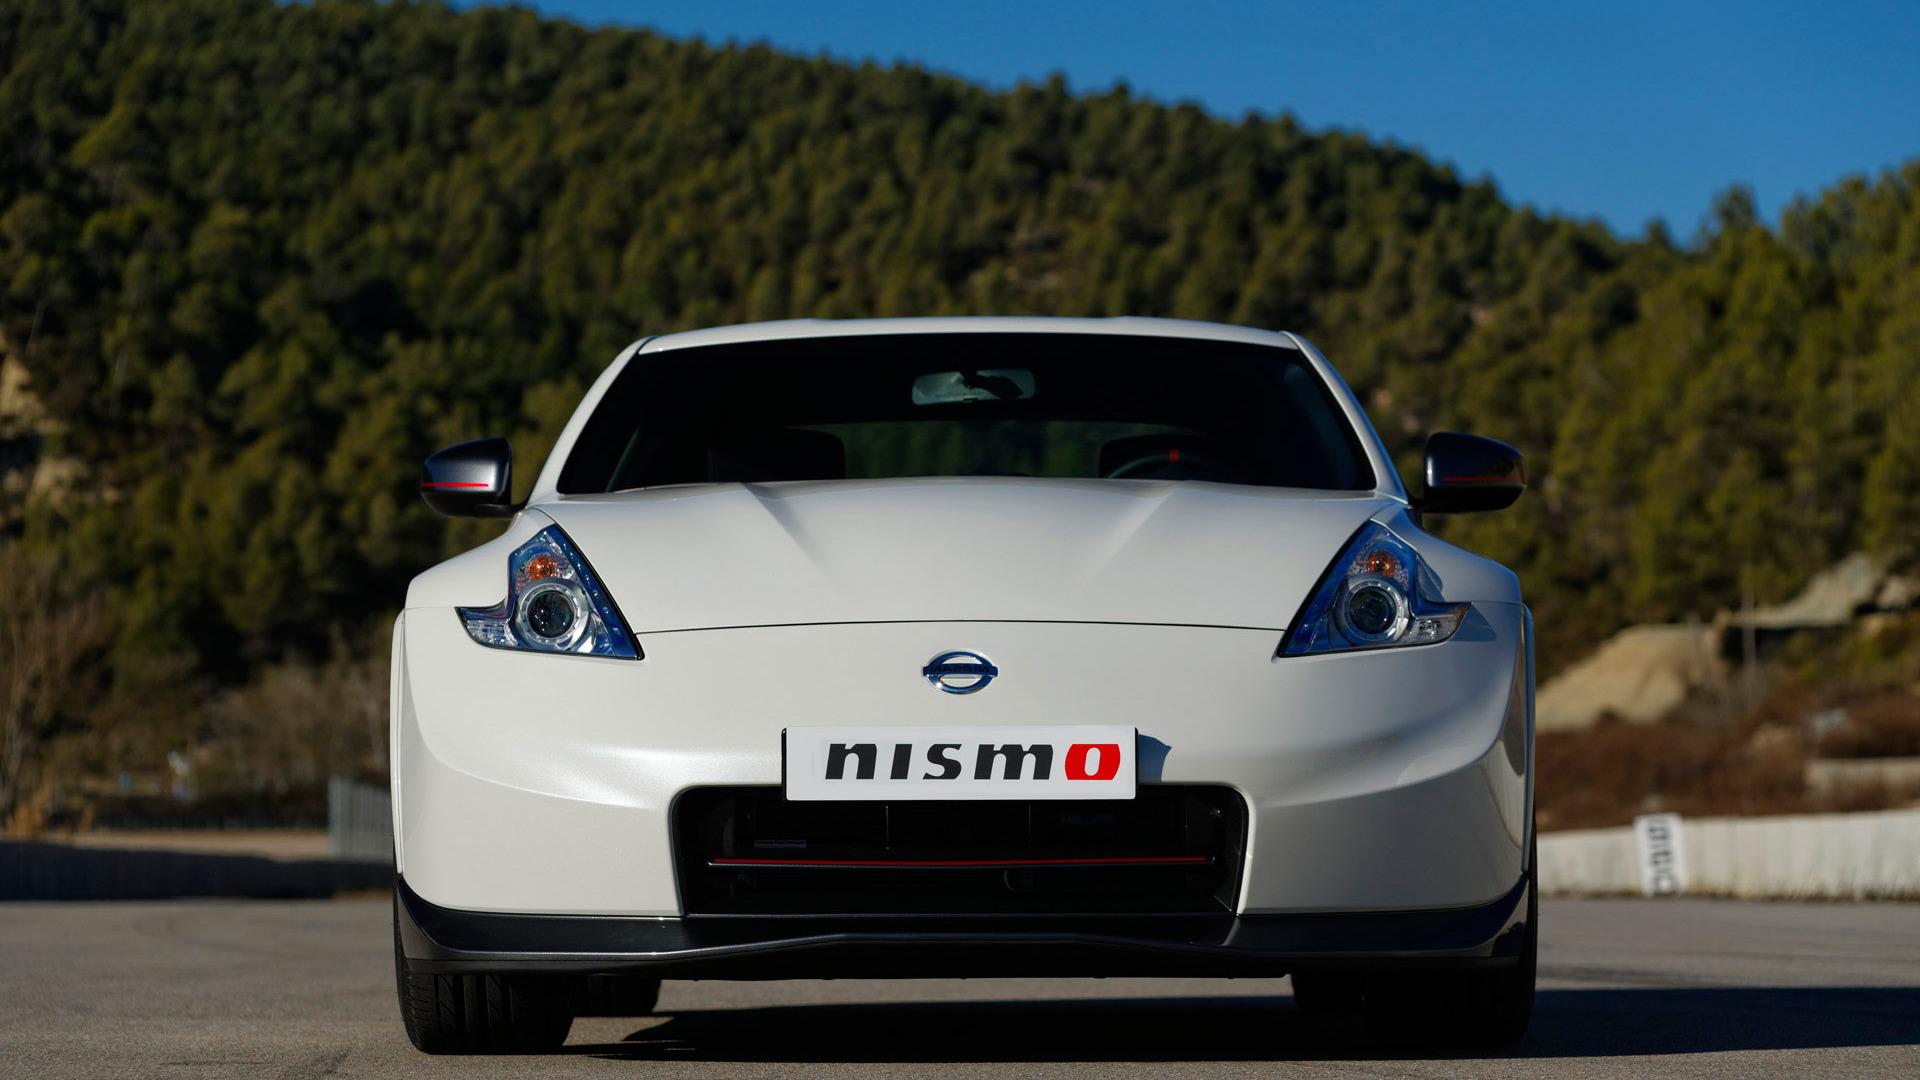 Download 2014 Nissan 370Z NISMO wallpaper 1920x1080